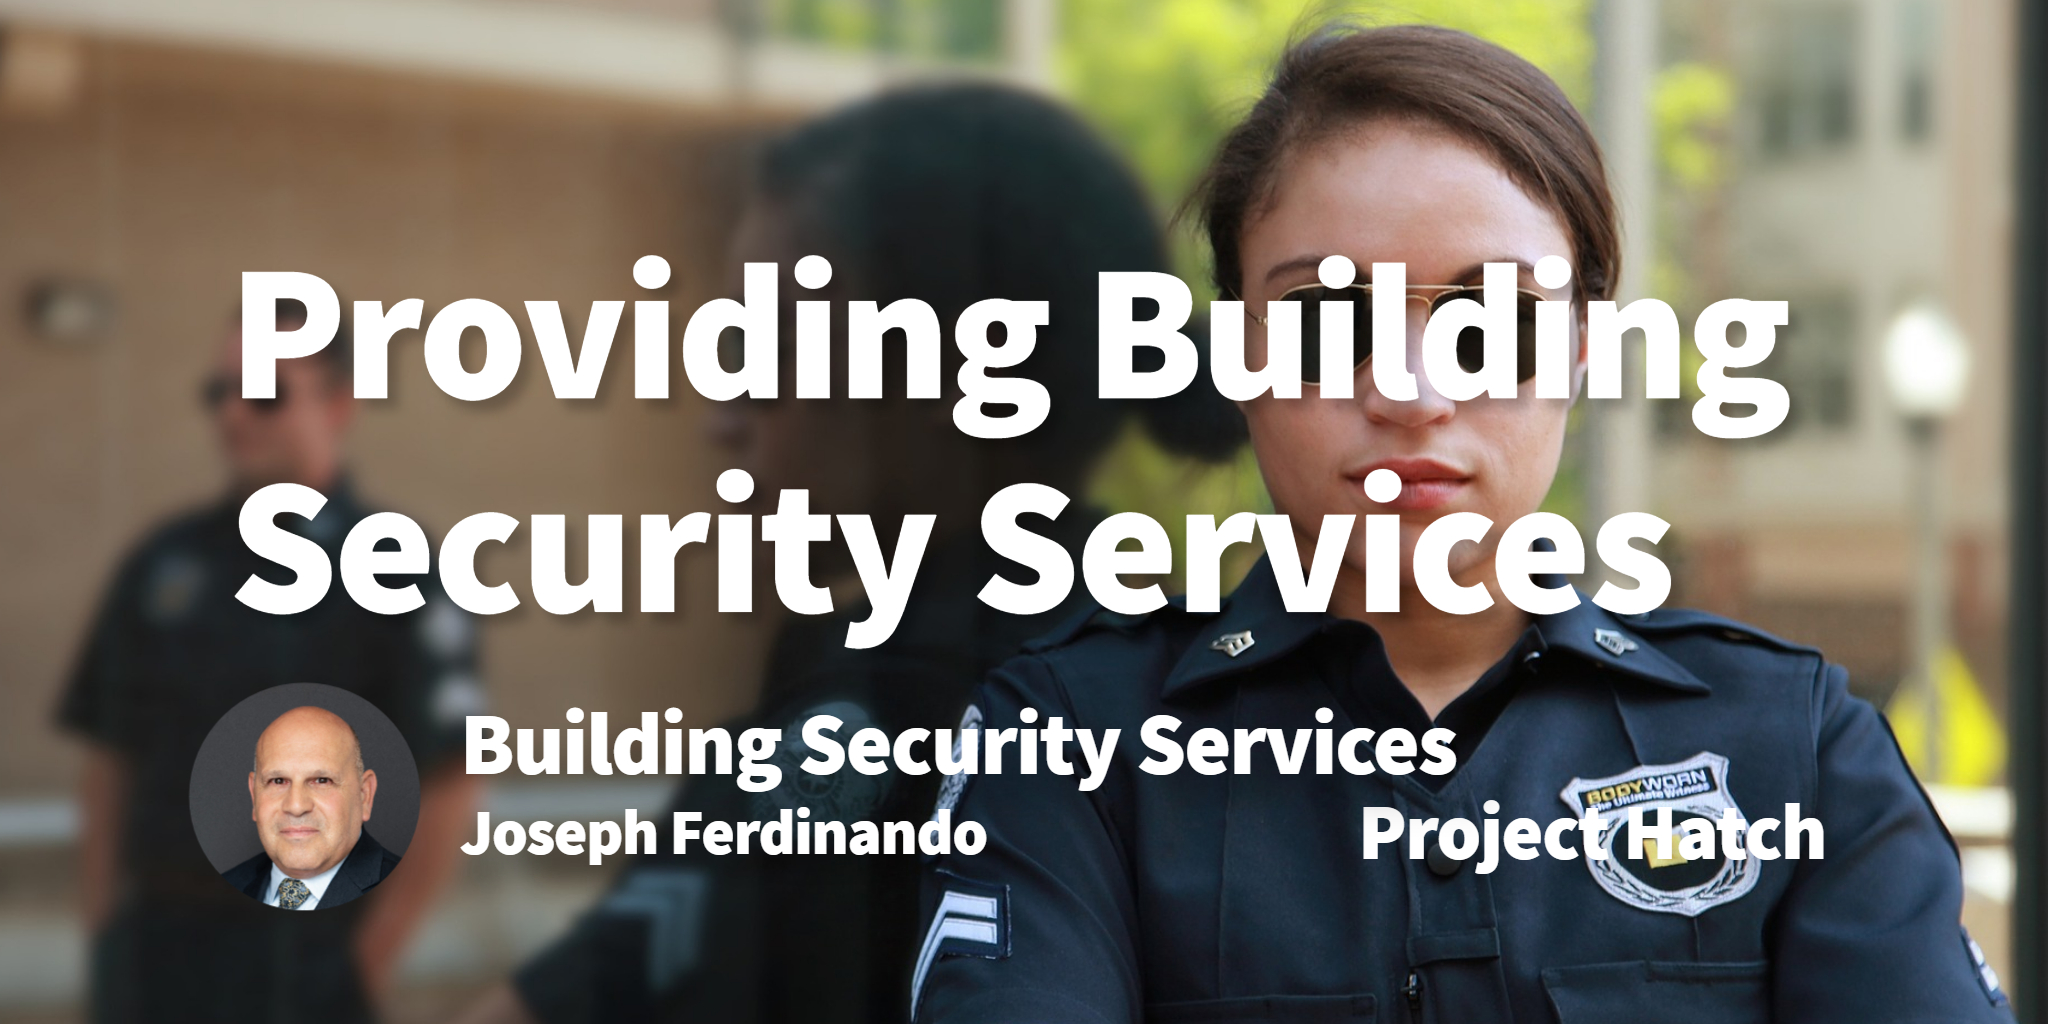 Building Security Services Joseph Ferdinando